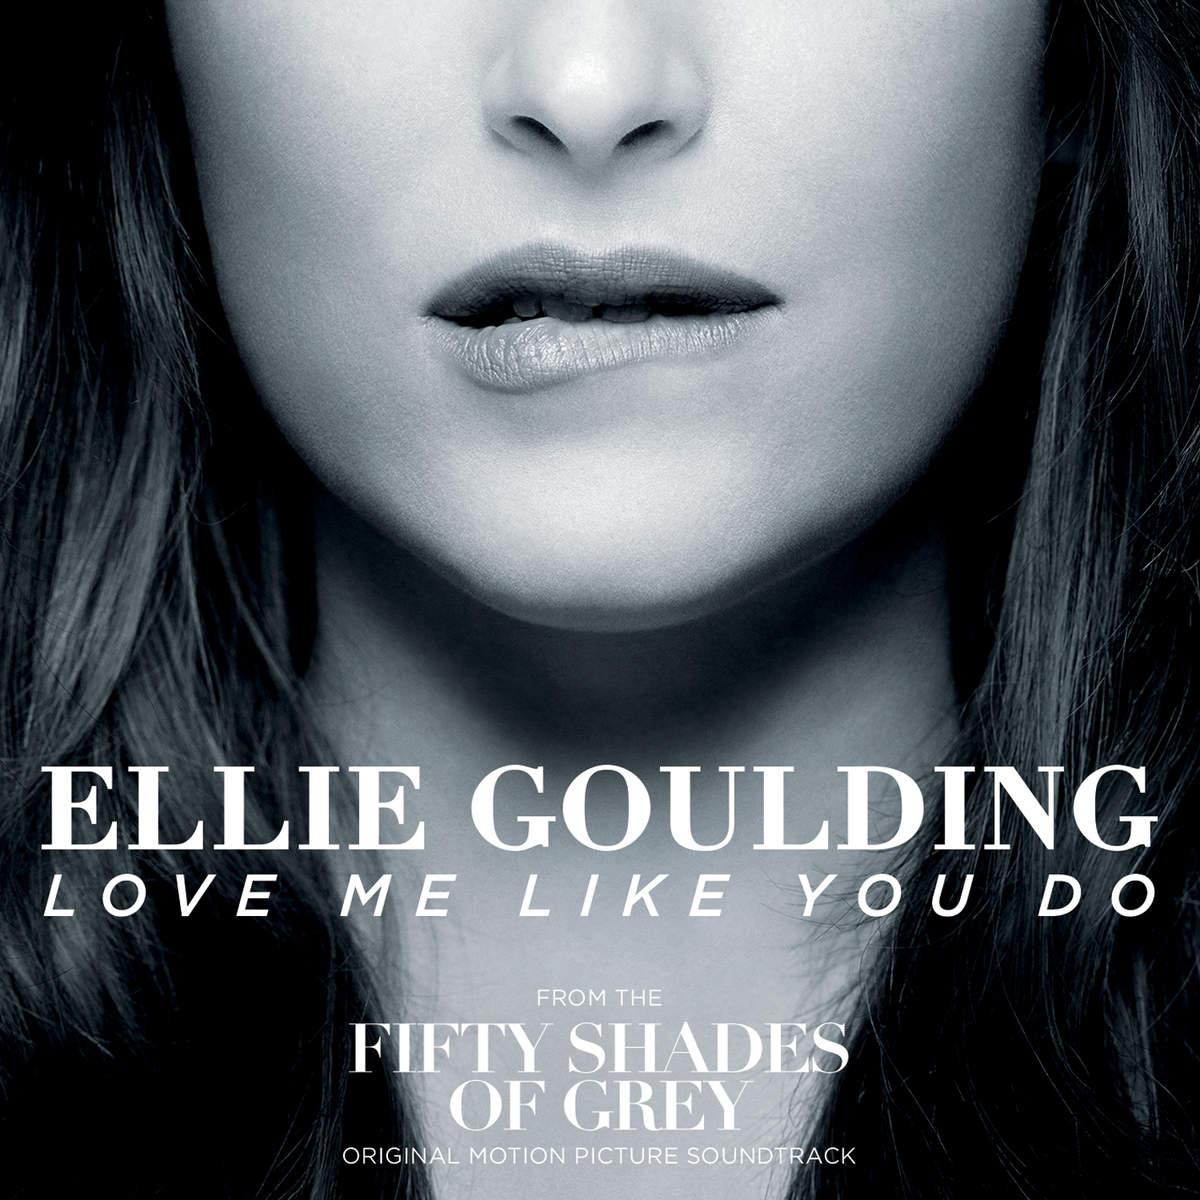 Love Me Like You Do (song) | Ellie Goulding Wiki | FANDOM powered ...